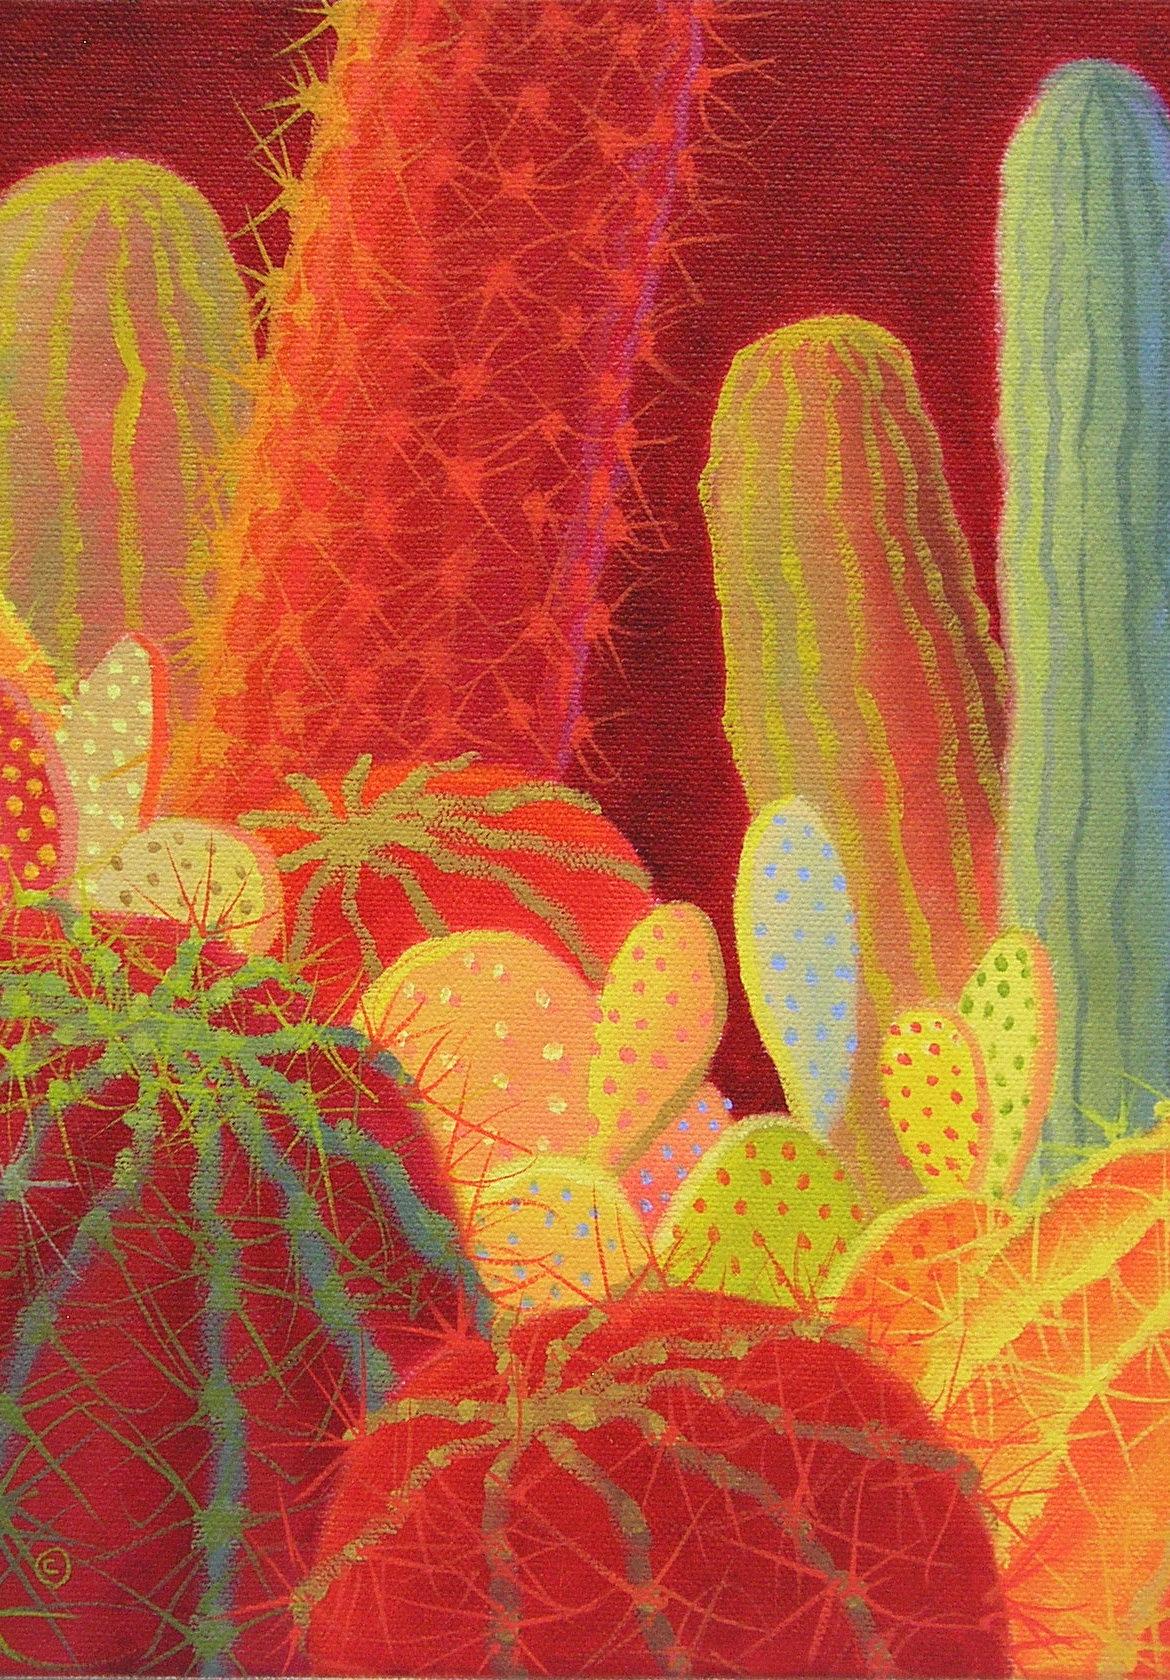 Desert Bloom #55, Sharon Weiser